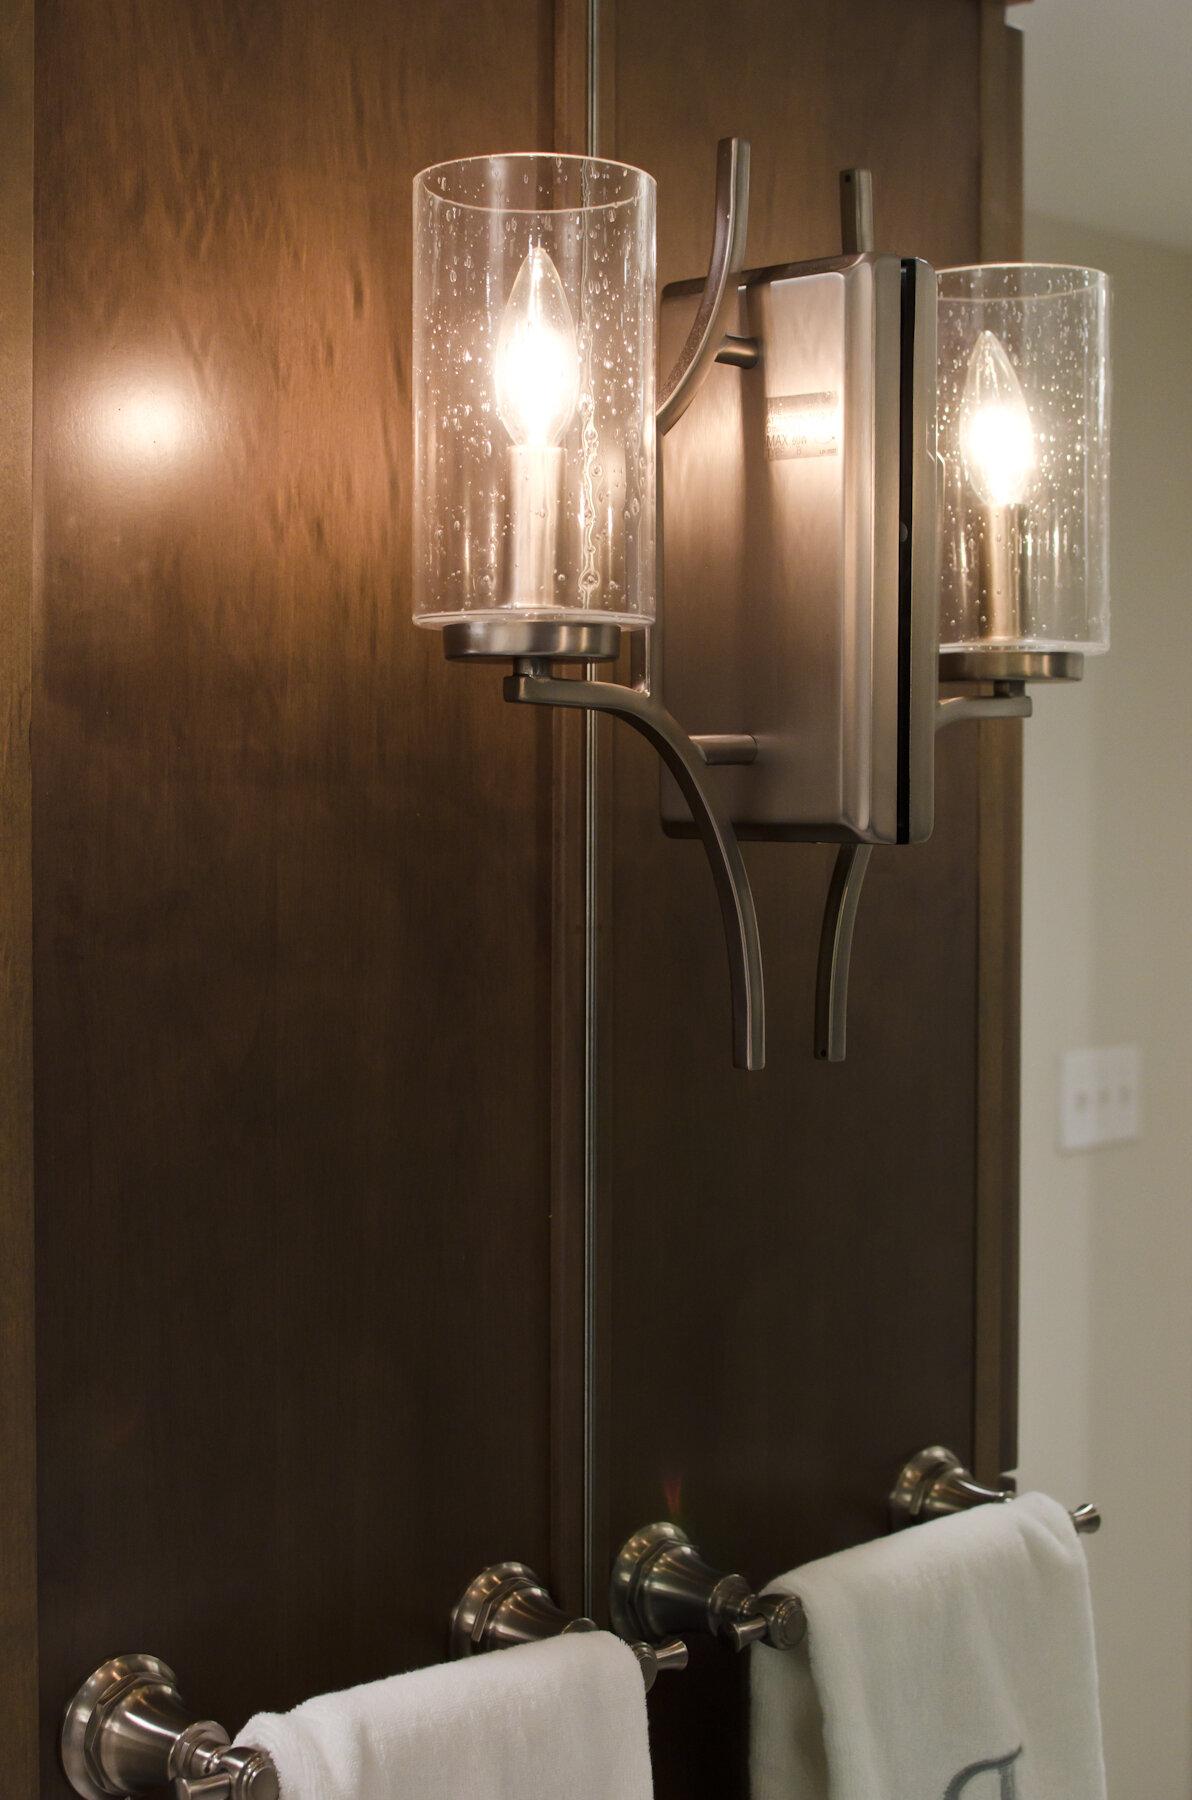 2019_CLI_Richmond_Virginia_Interior_Designer_Contractor_West_End_Master_Bathroom_Ryther-18.jpg